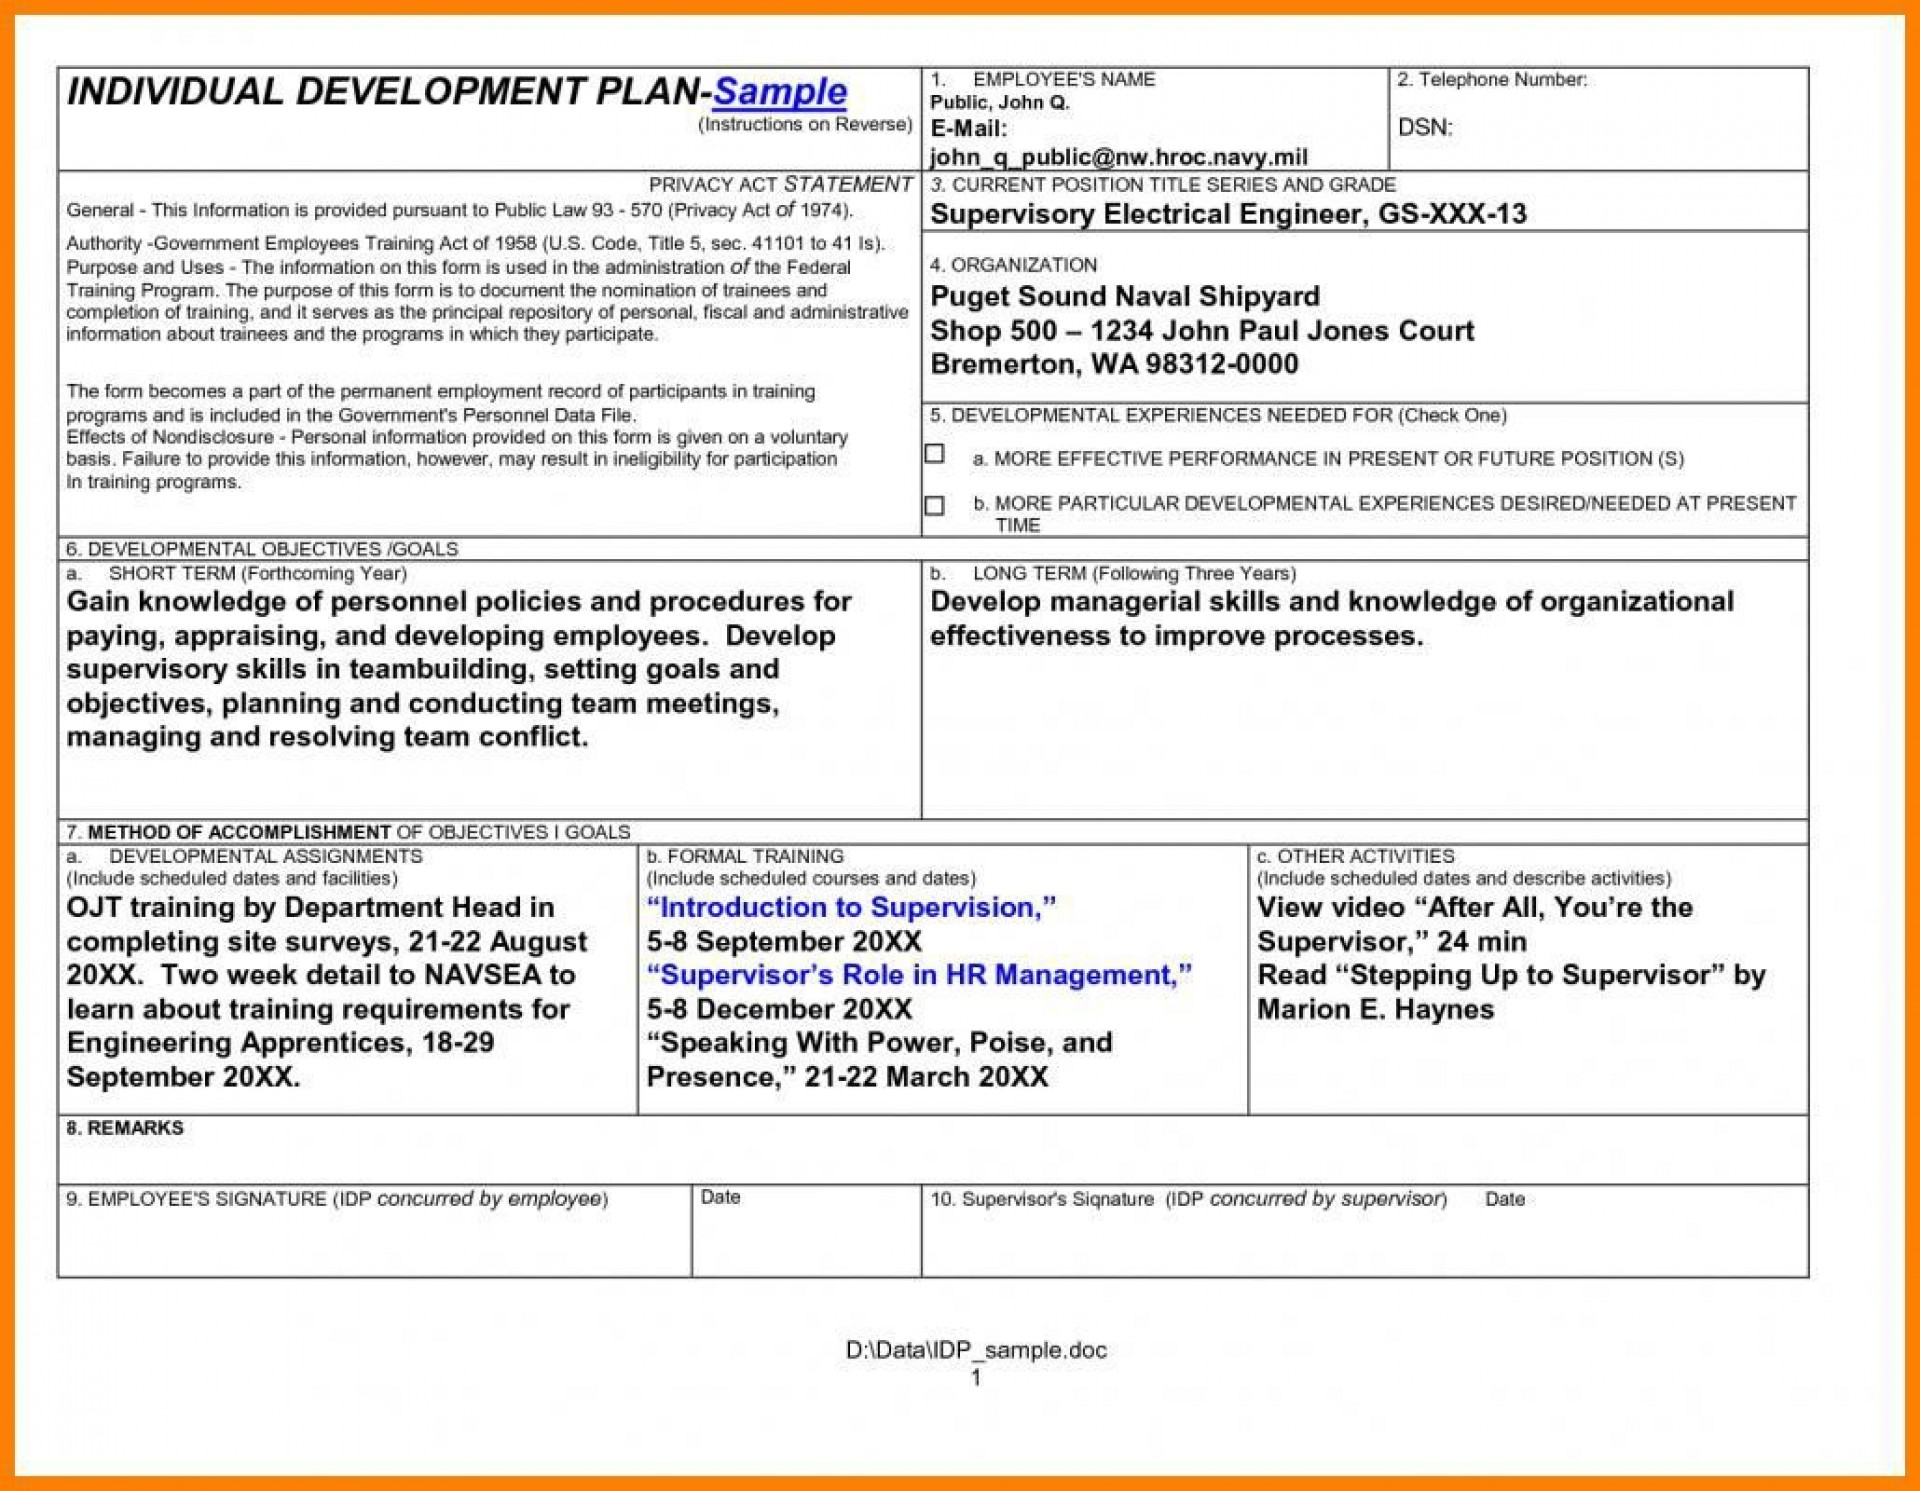 008 Remarkable Professional Development Plan For Teacher Template Doc Idea 1920